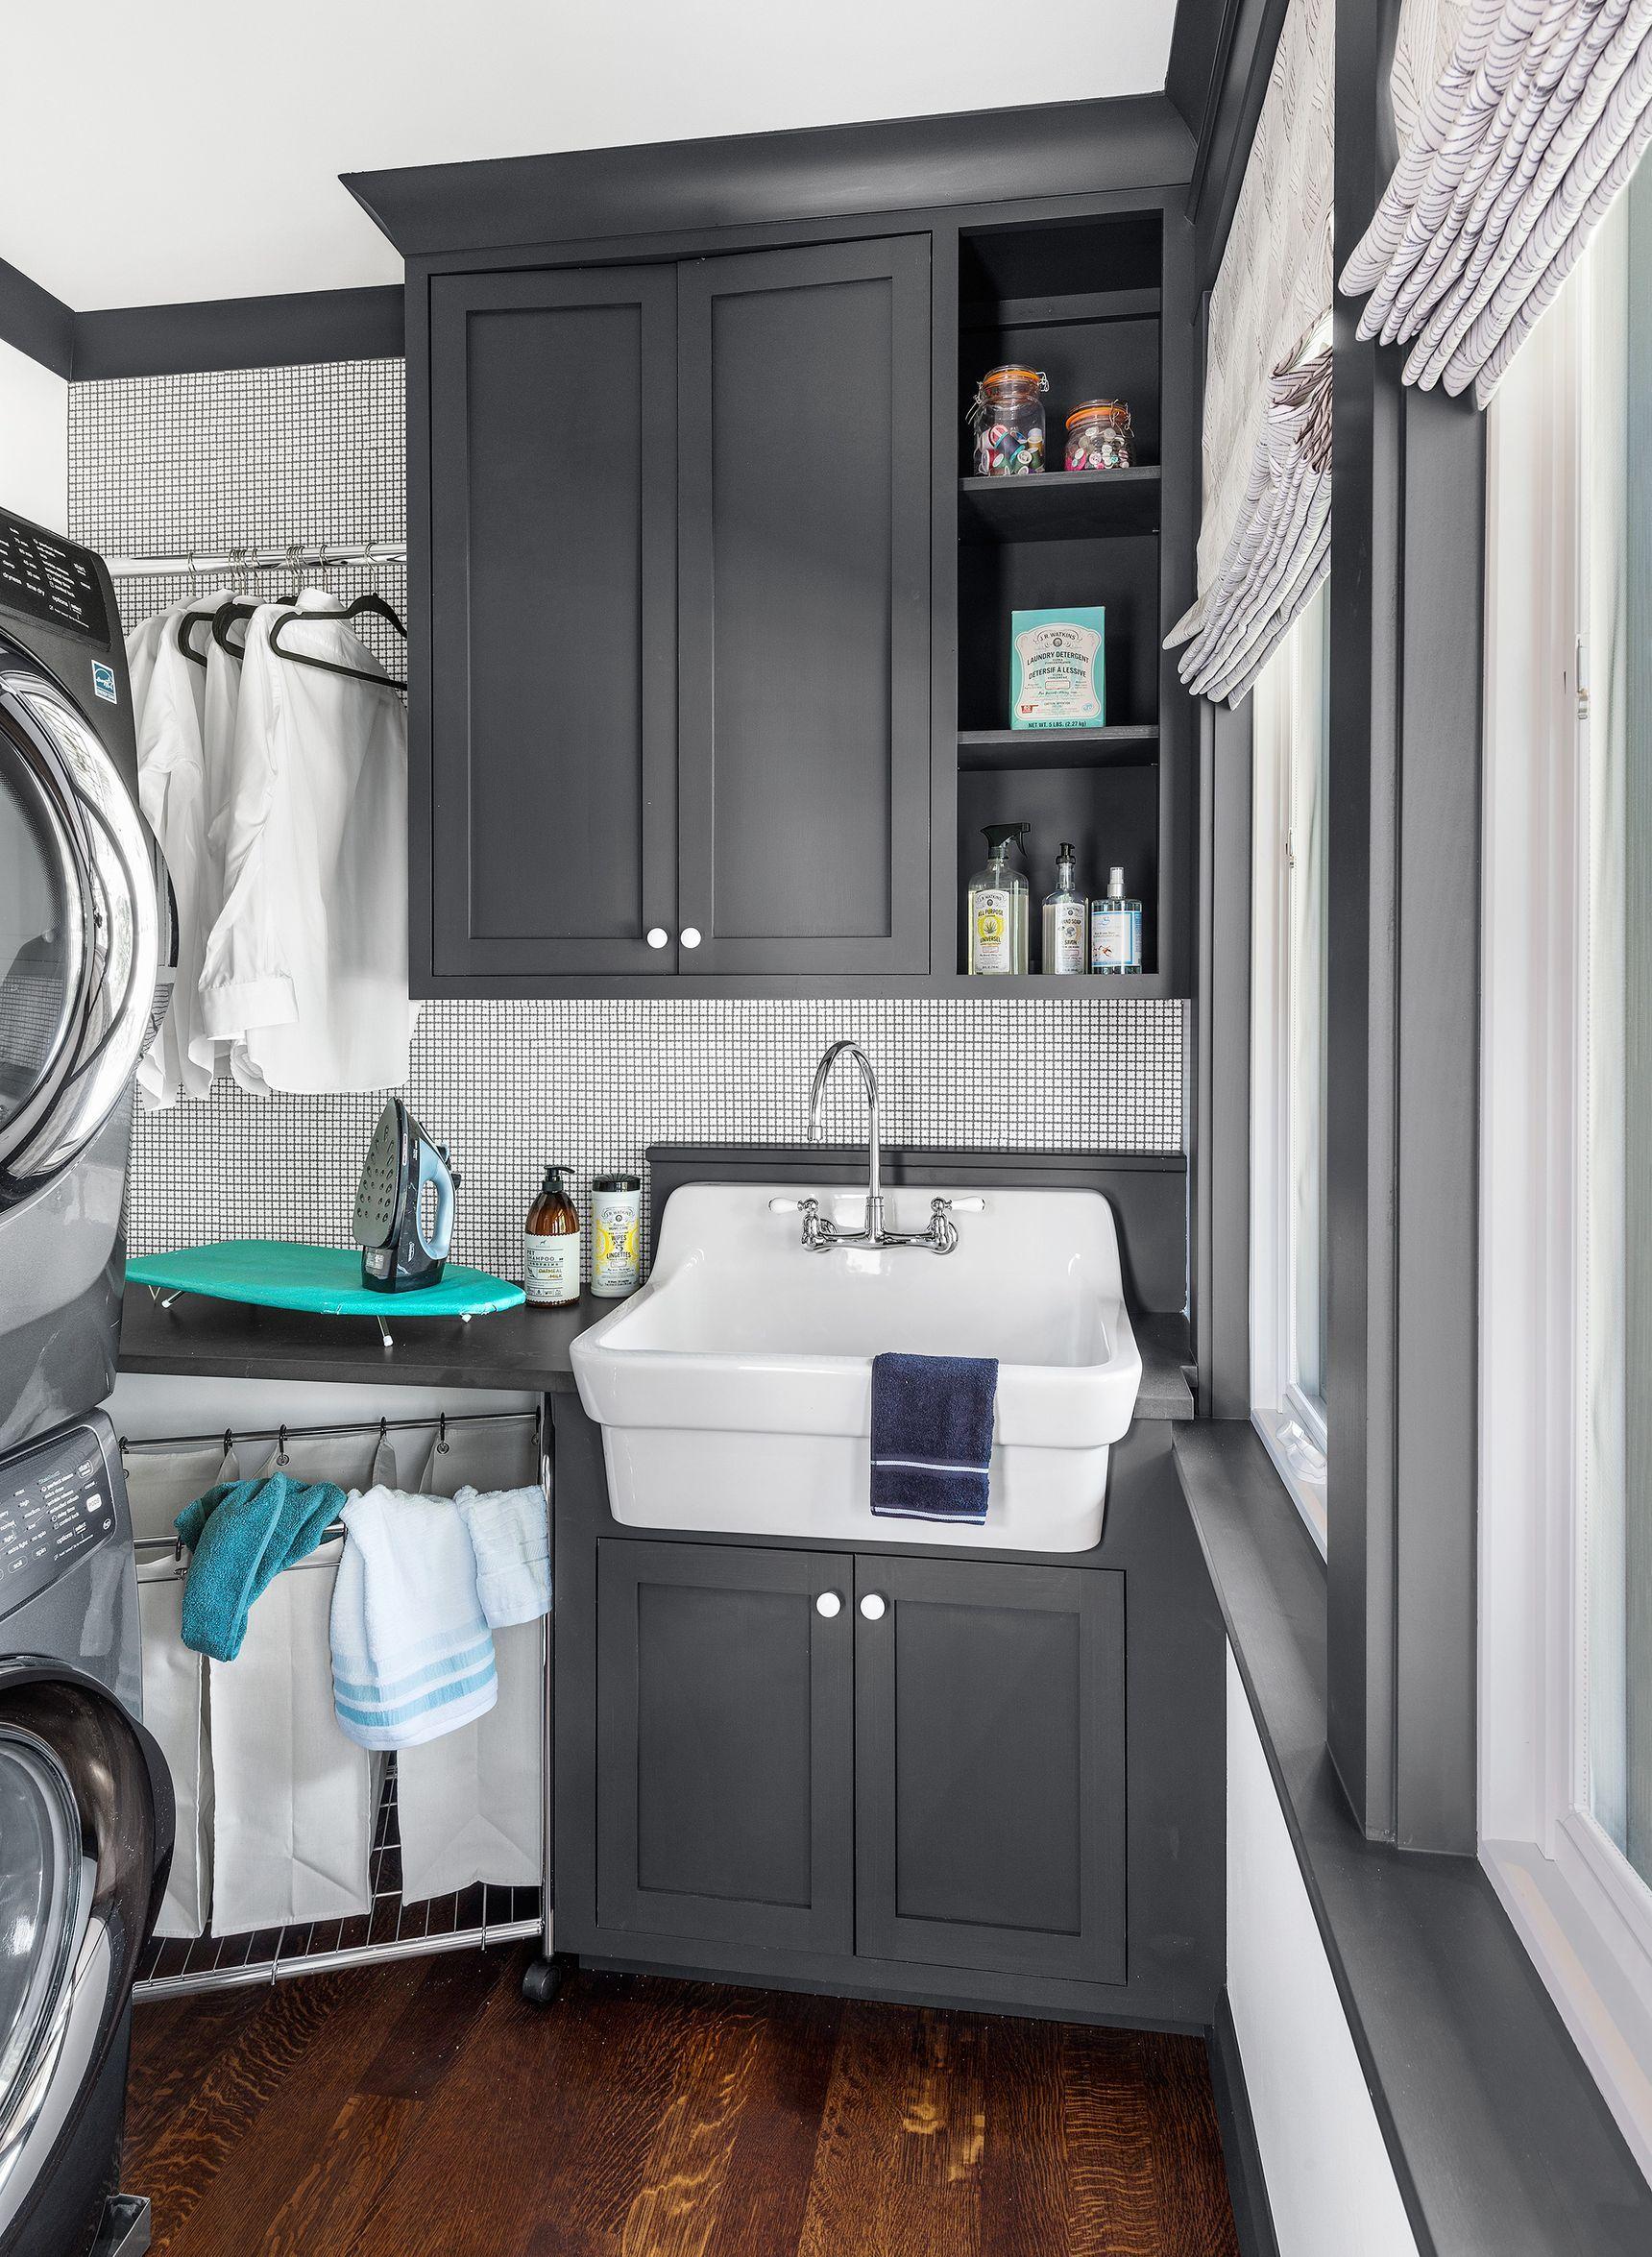 In Fine Detail 2018 Idea House Finale In 2020 Laundry Room Ideas Small Space Small Laundry Room Laundry Room Storage Shelves